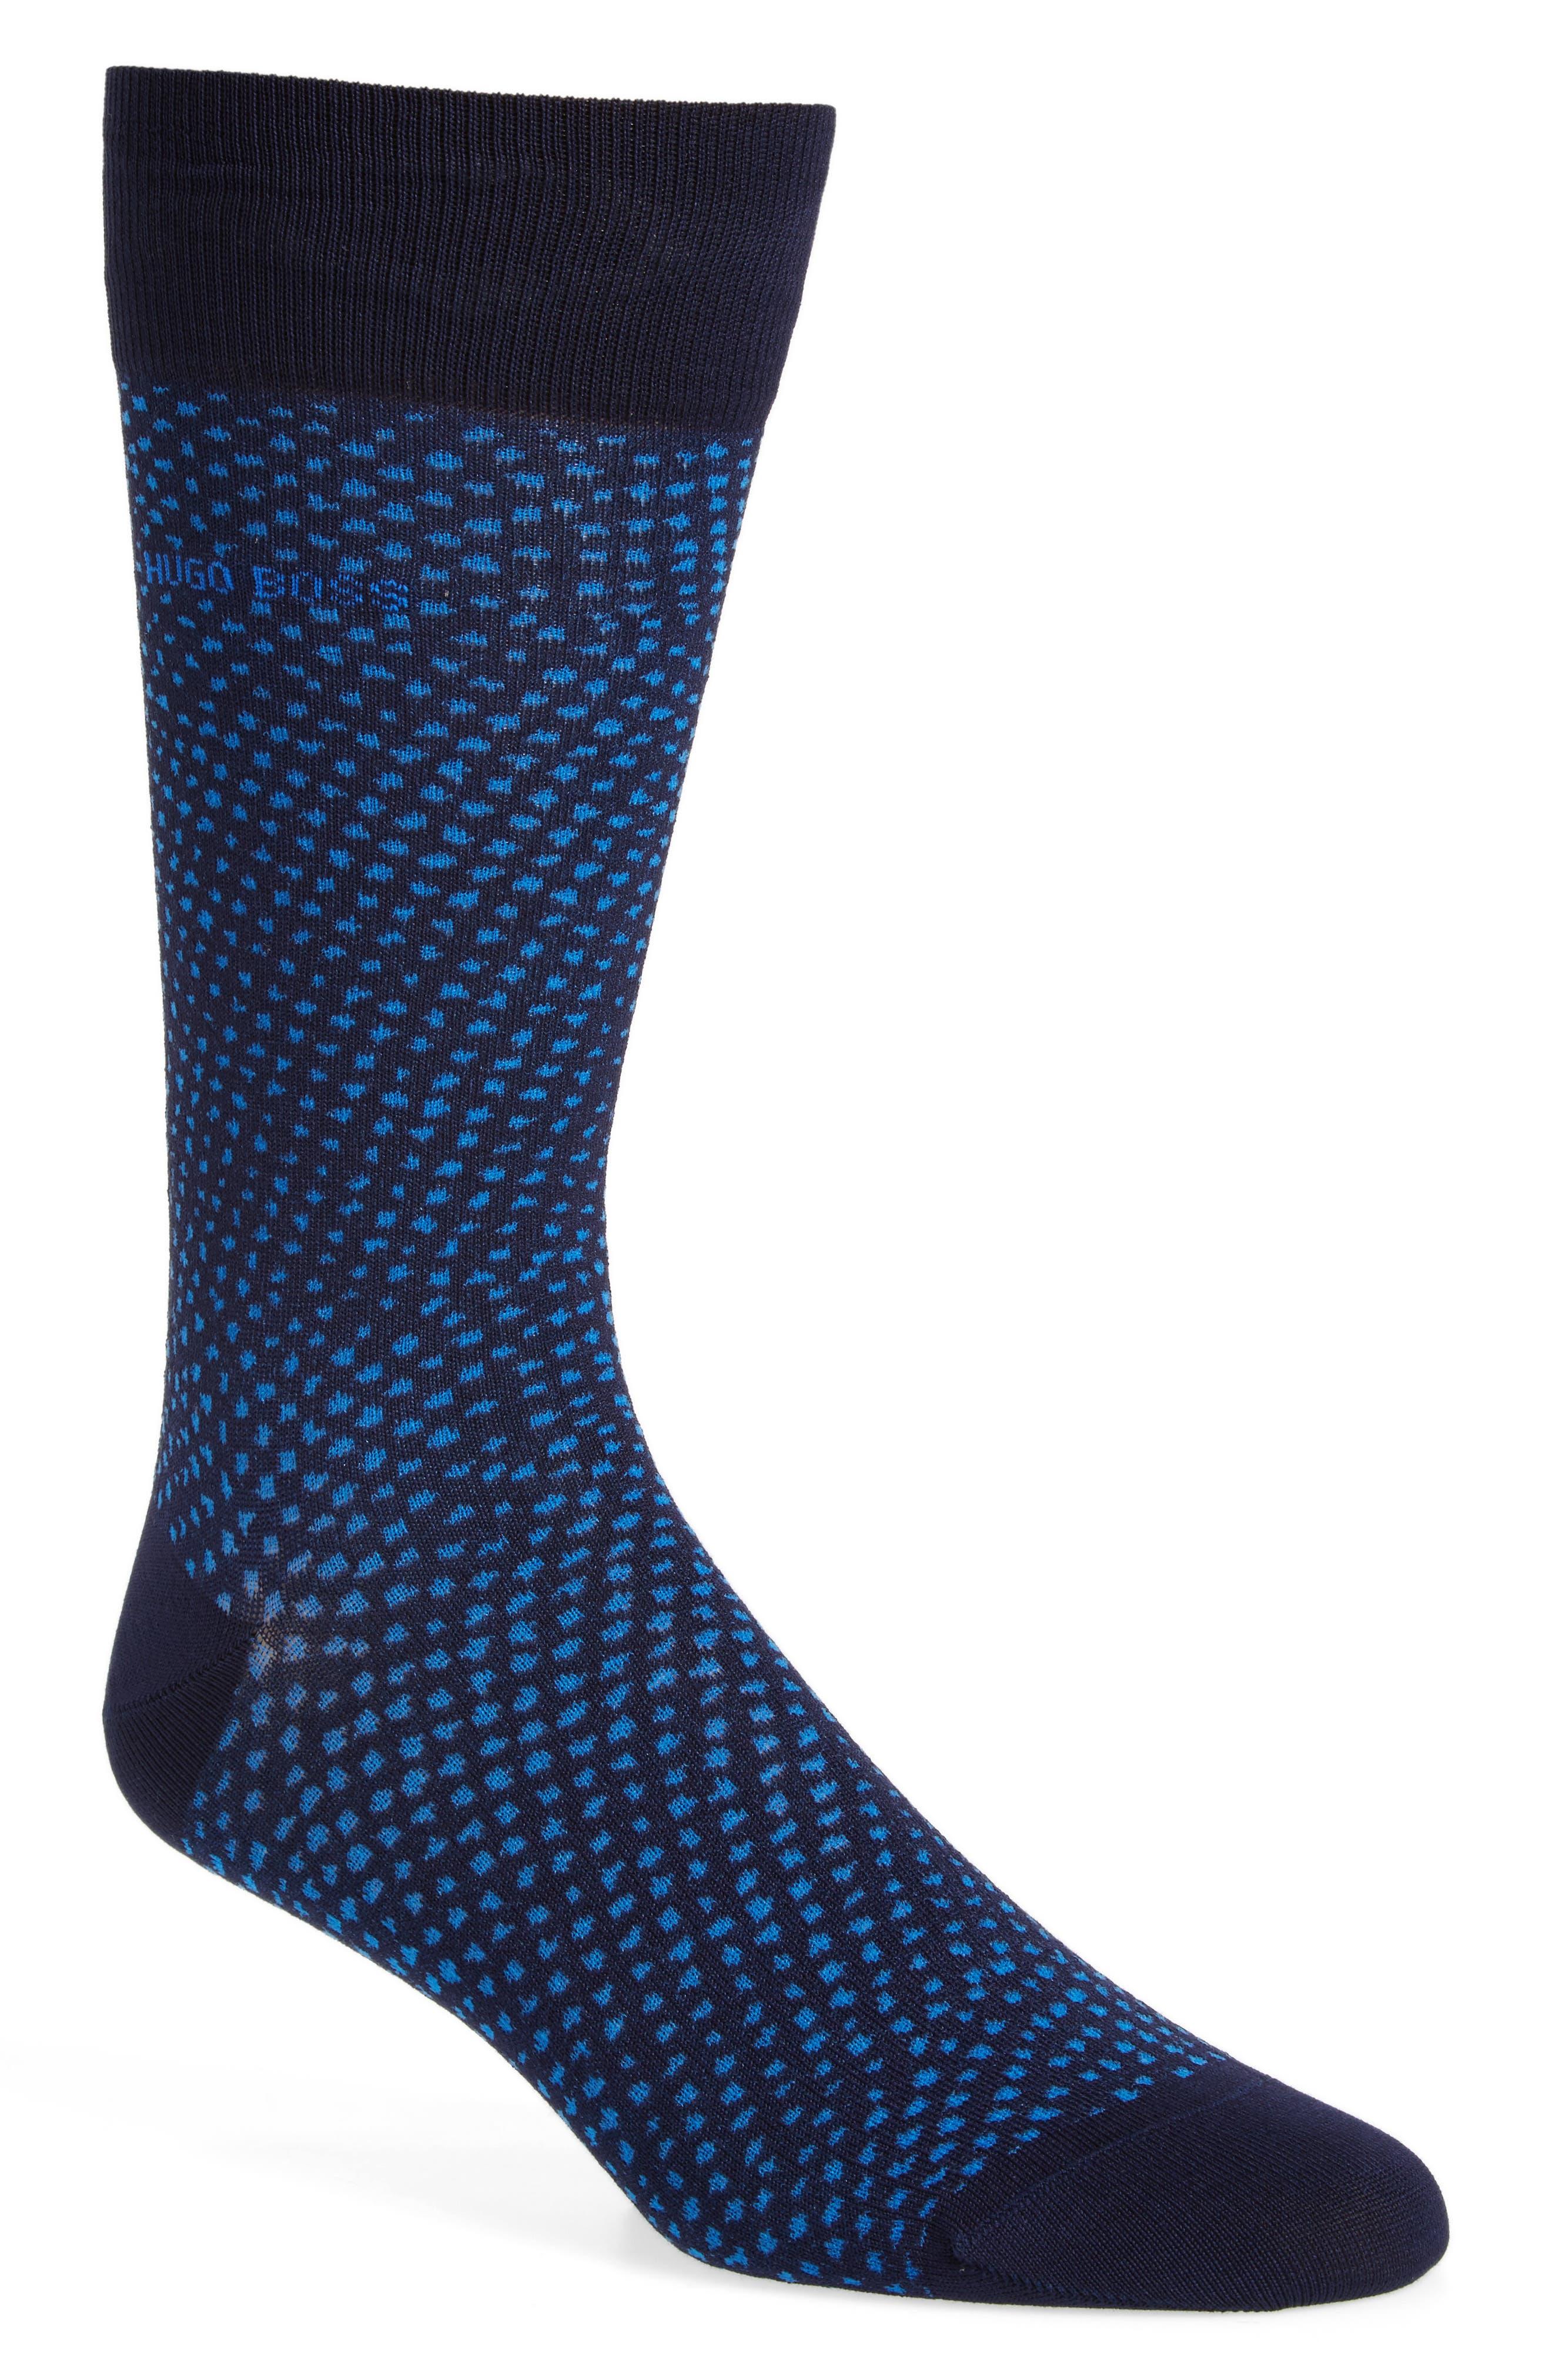 BOSS RS Design Gradient Microdot Socks